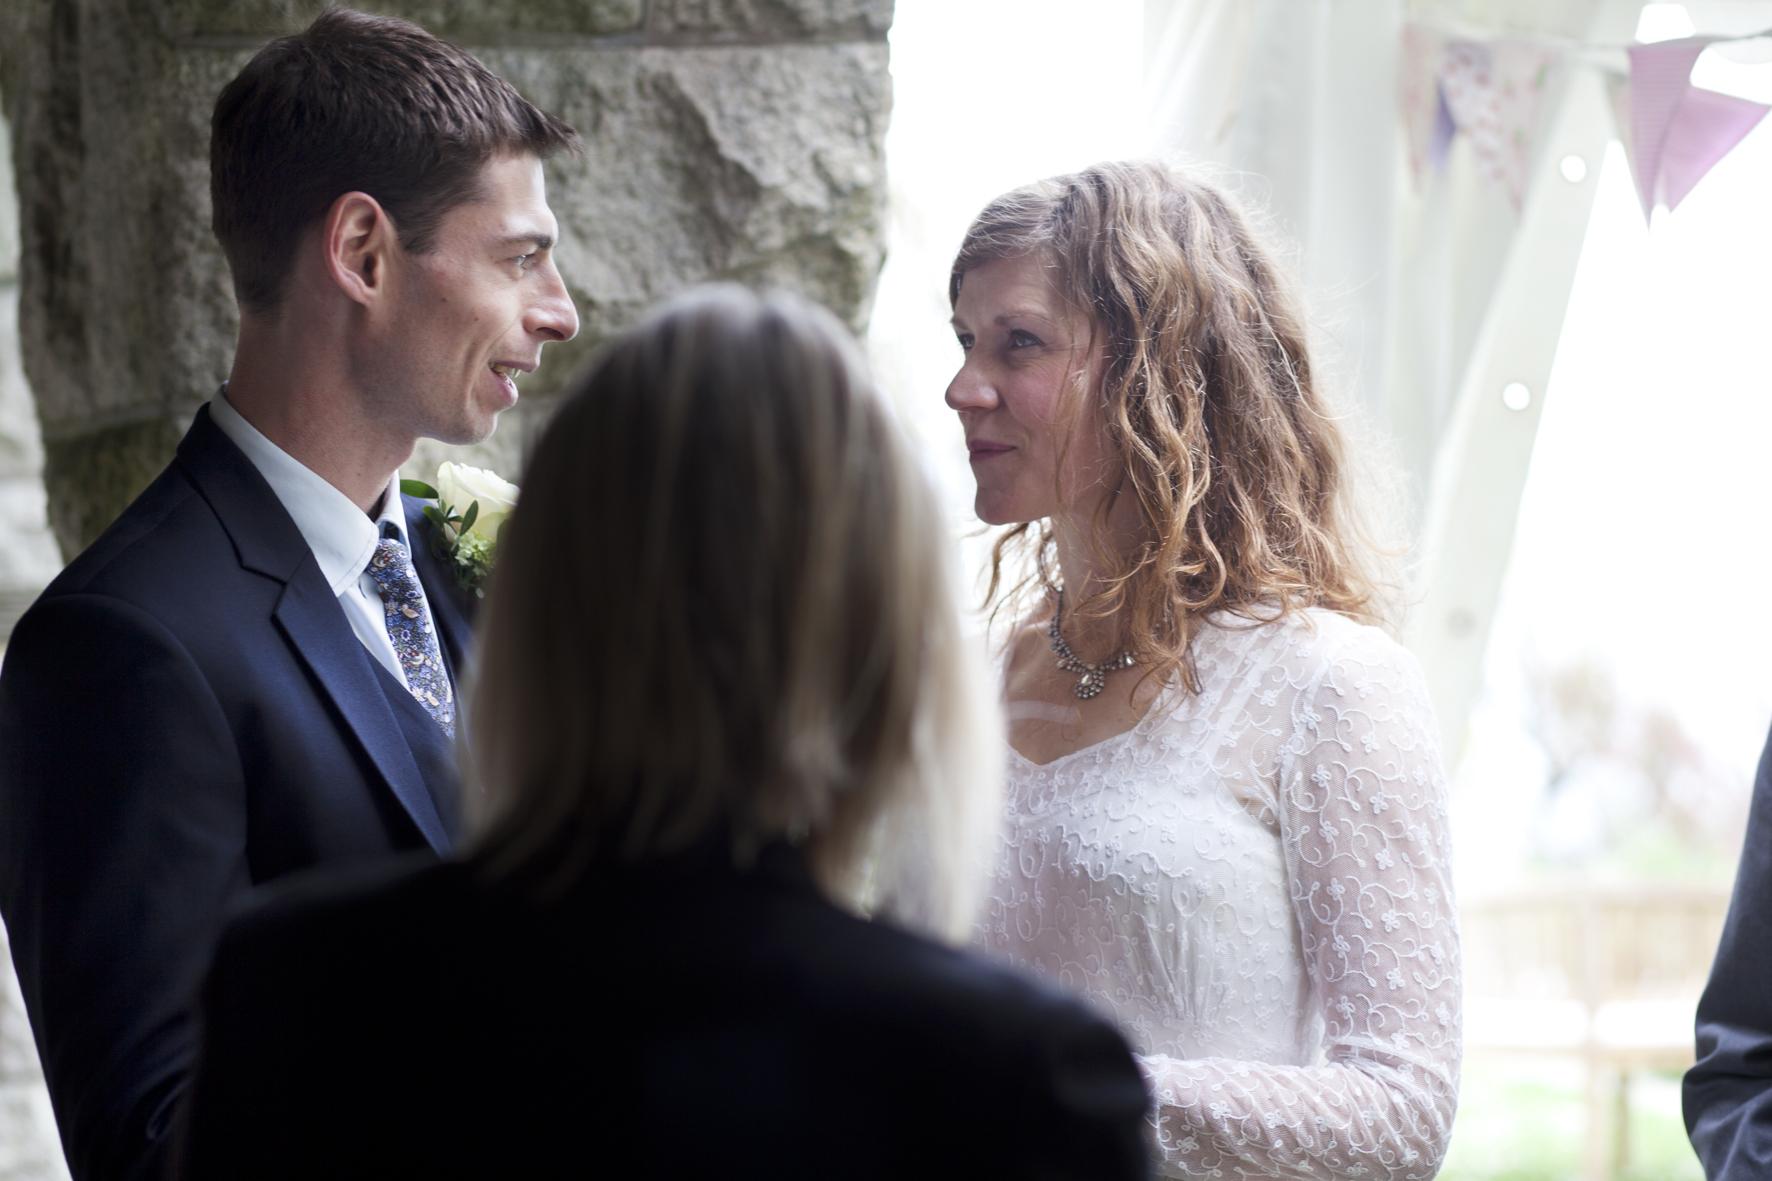 Wedding example_M&P__MG_3407-Edit_Claudia Leisinger.jpg